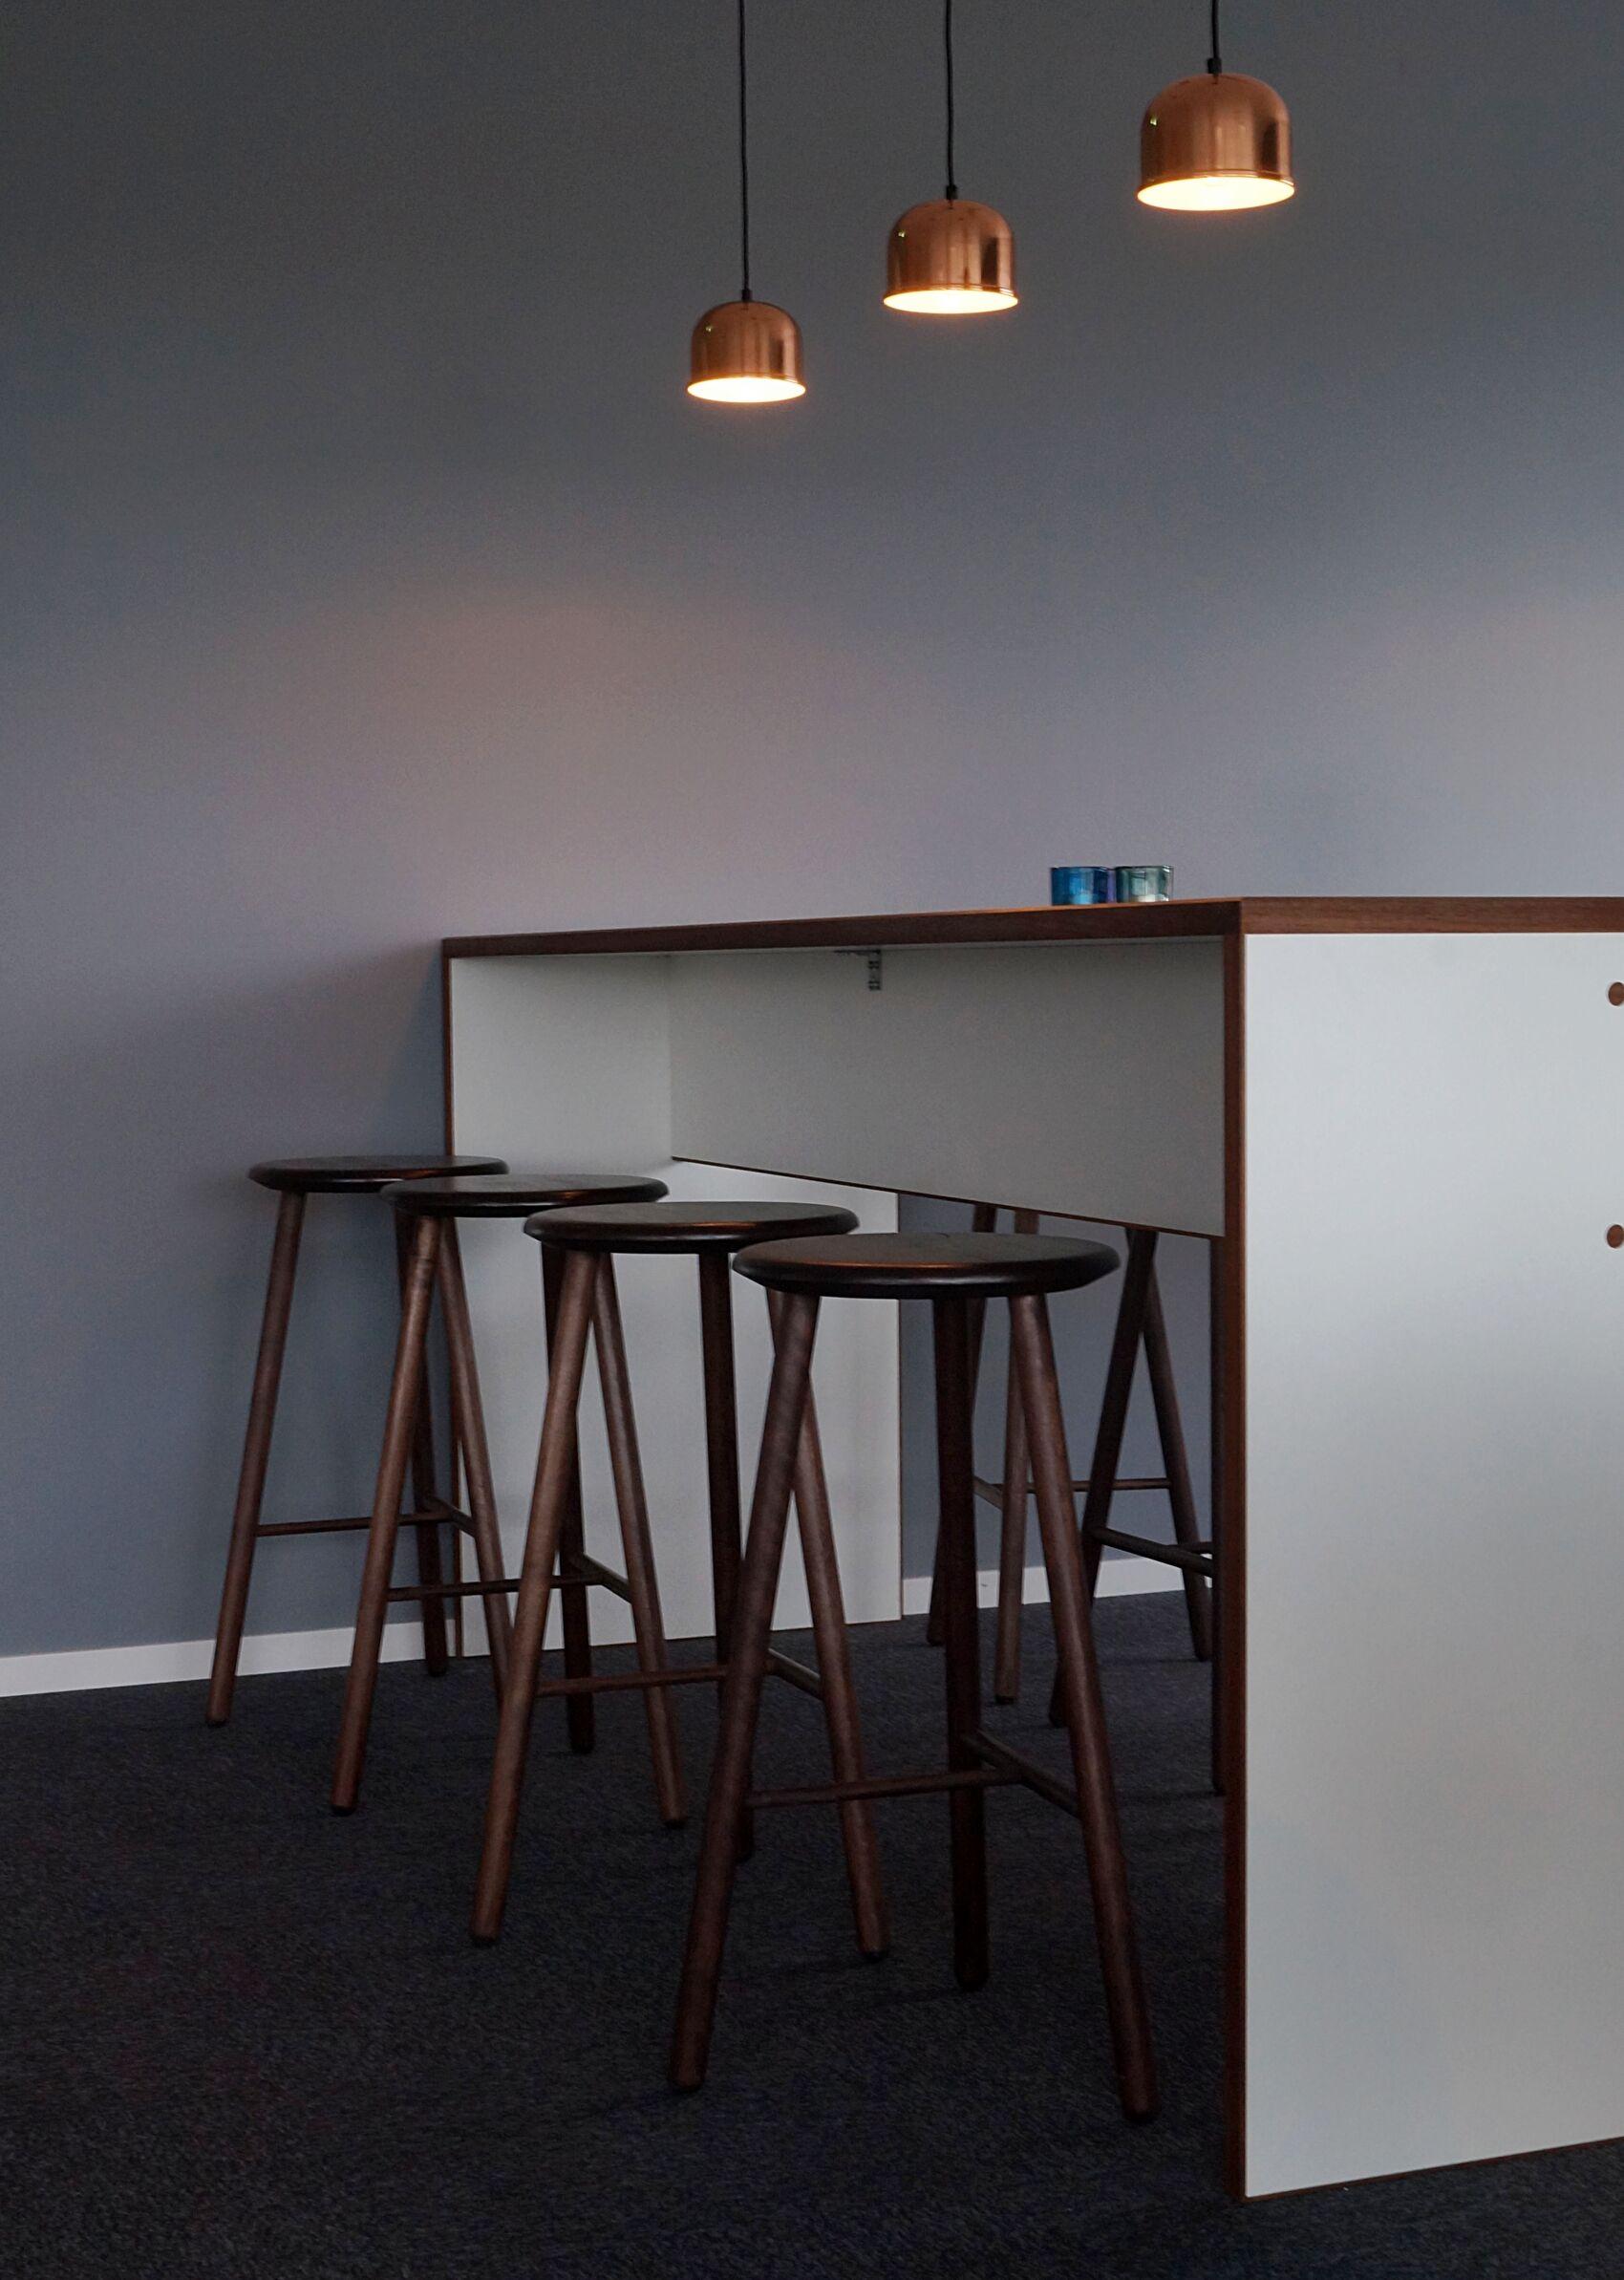 ncc-kontor-addsimplicity-barbord